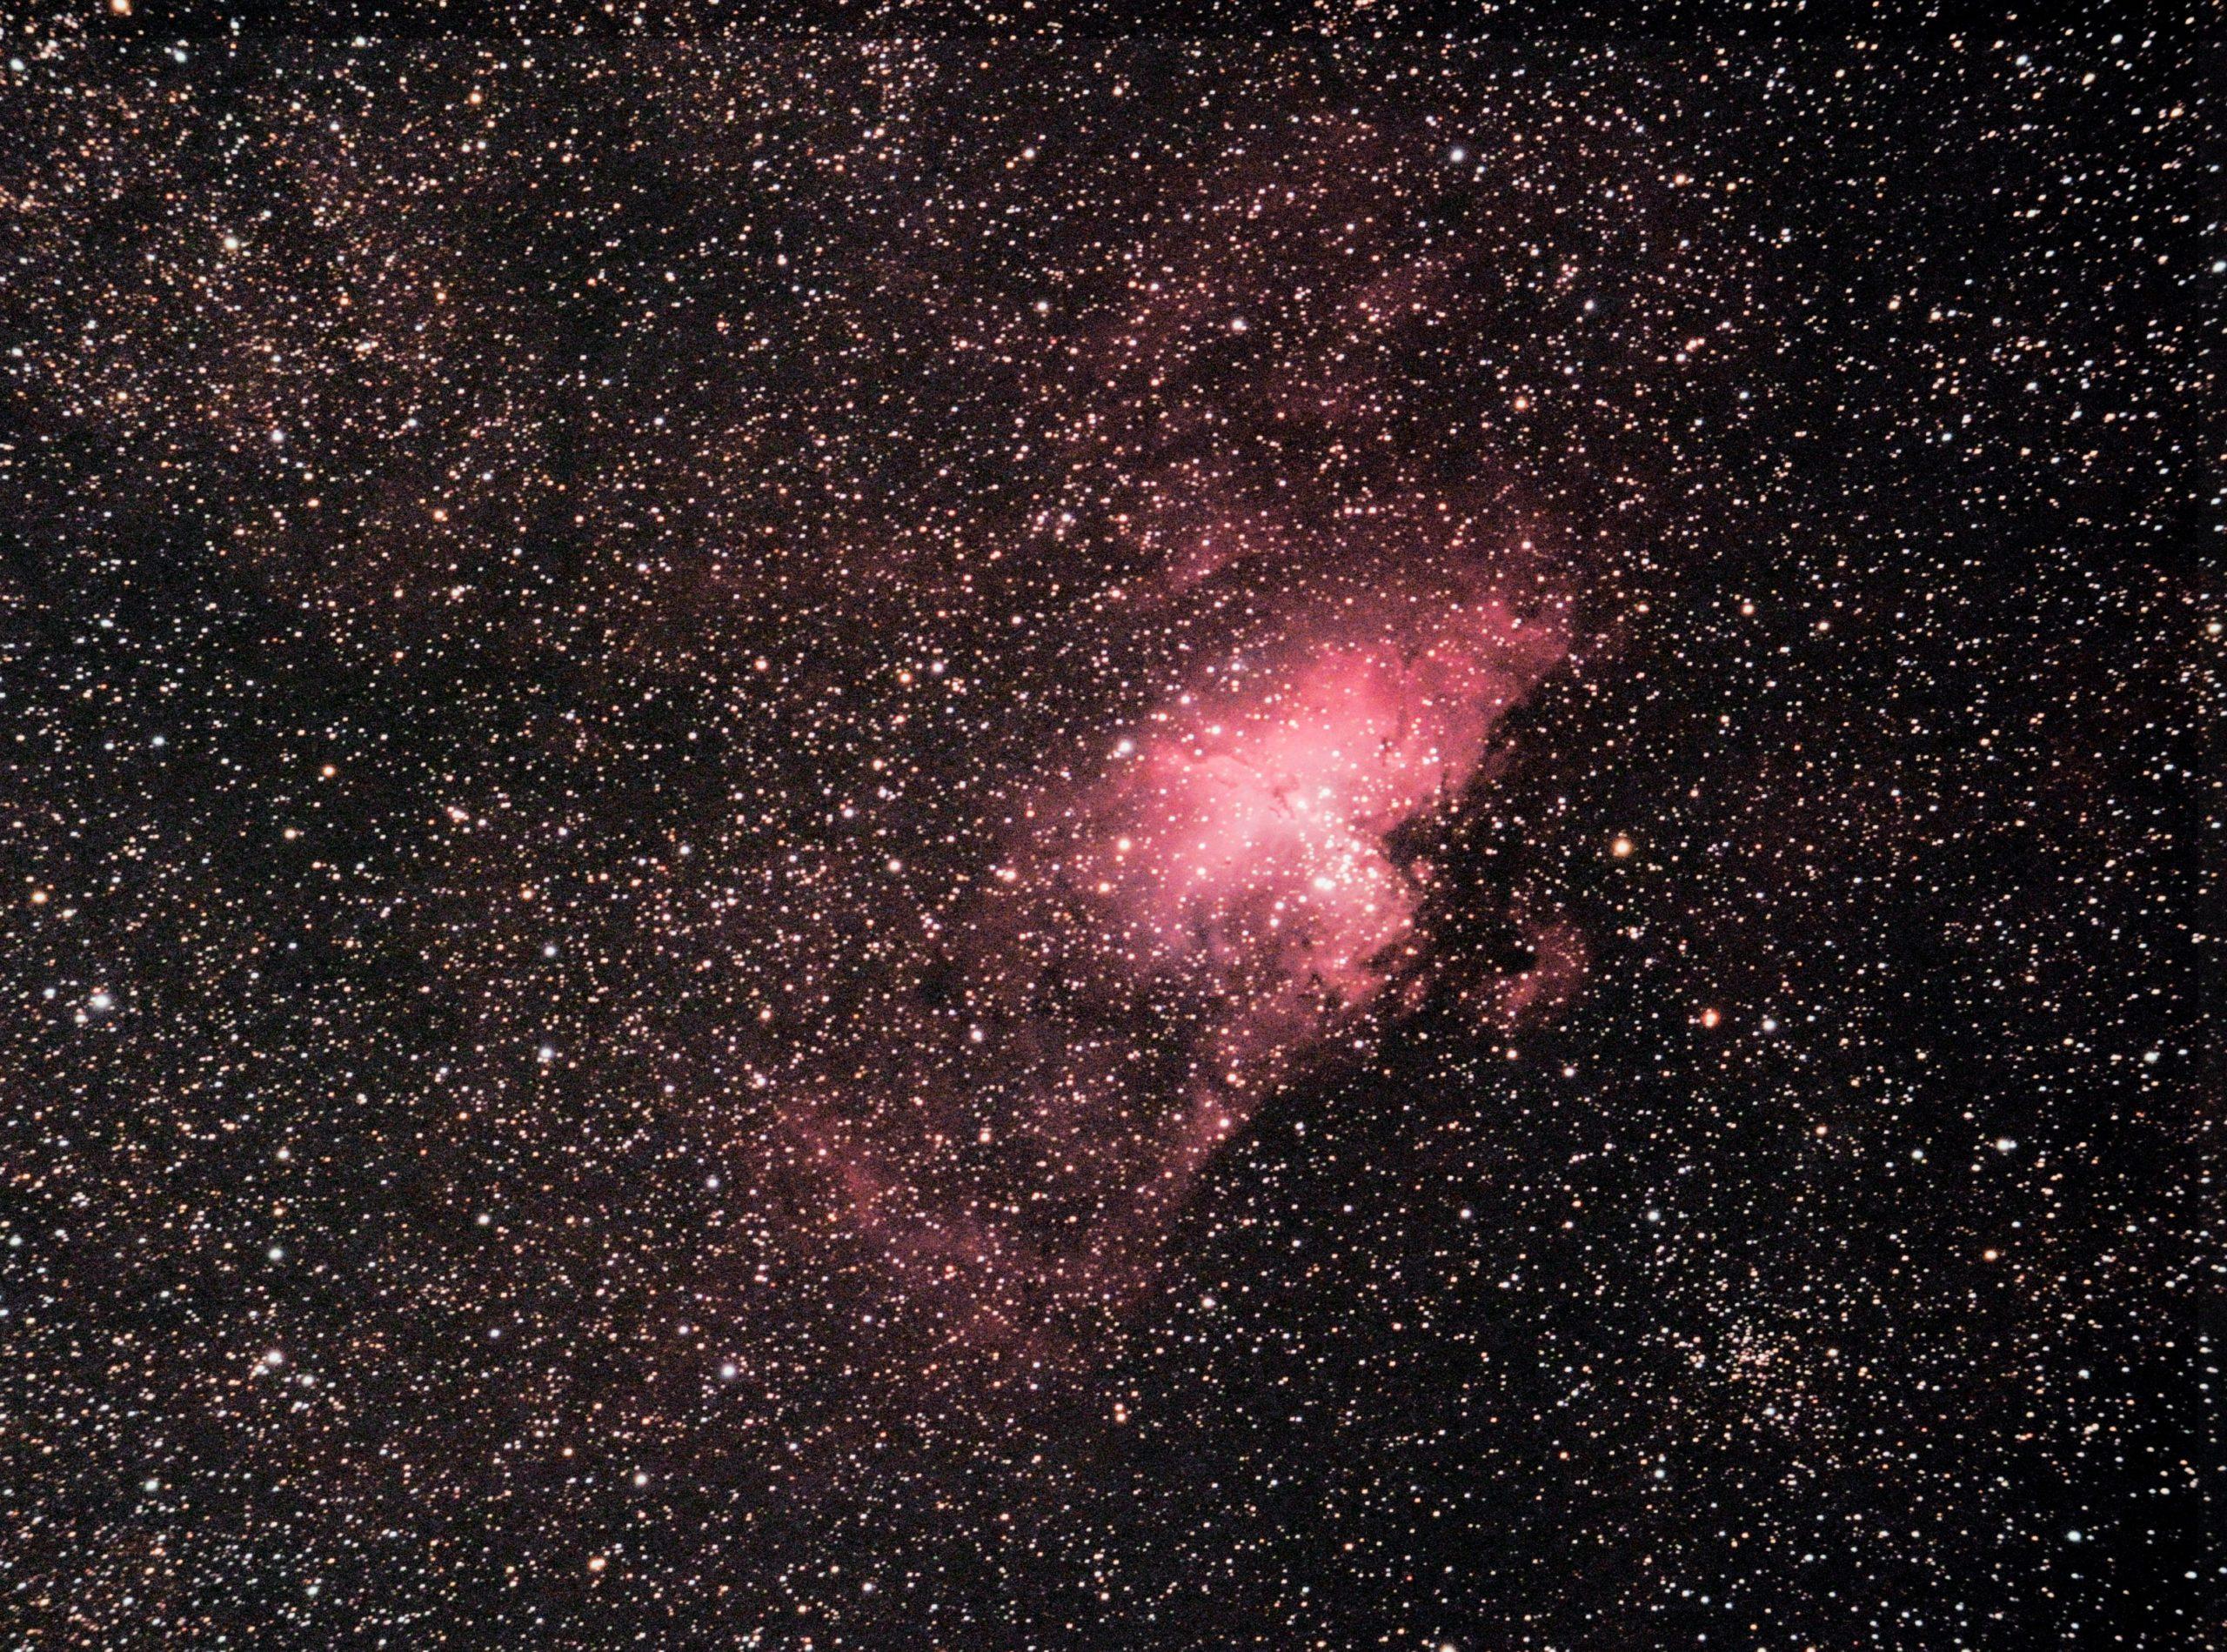 Denis-OShea-Eagle-nebula-2019-@-Fregenal-de-la-seirra-scaled